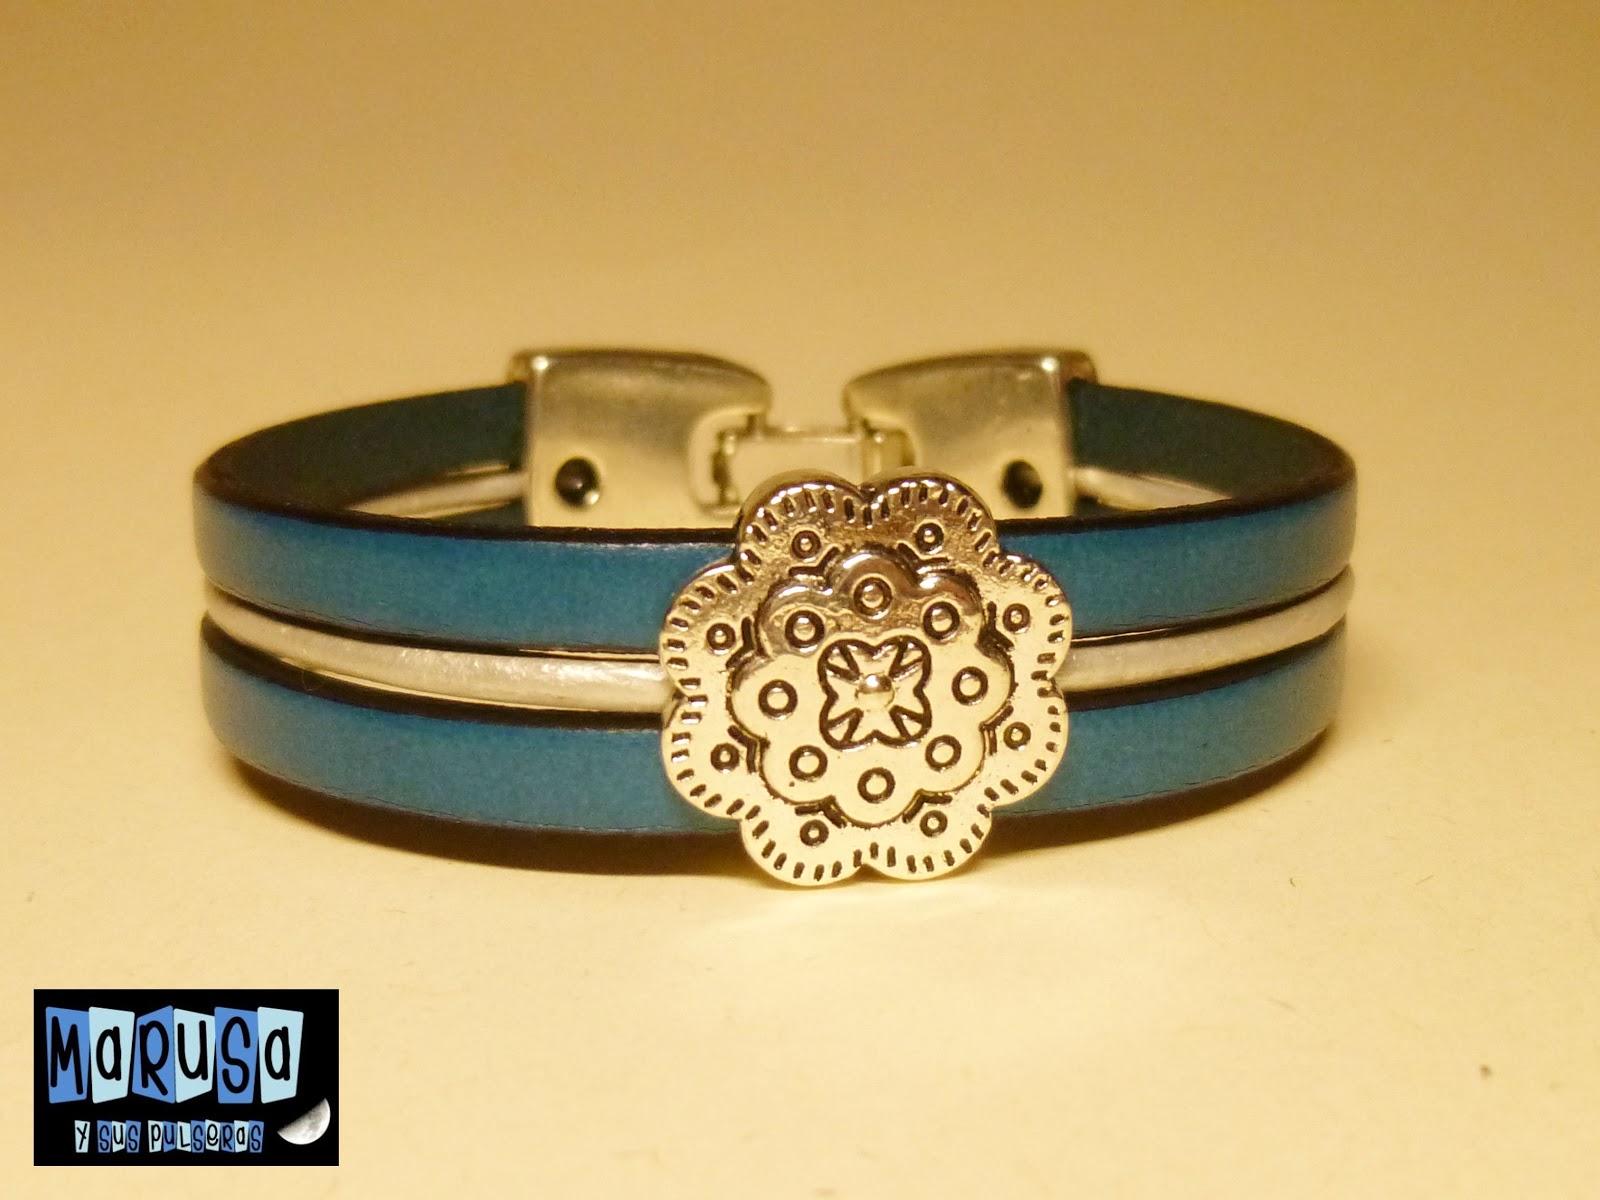 pulsera piel marusa bonita original barata € regalo reyes madre novia